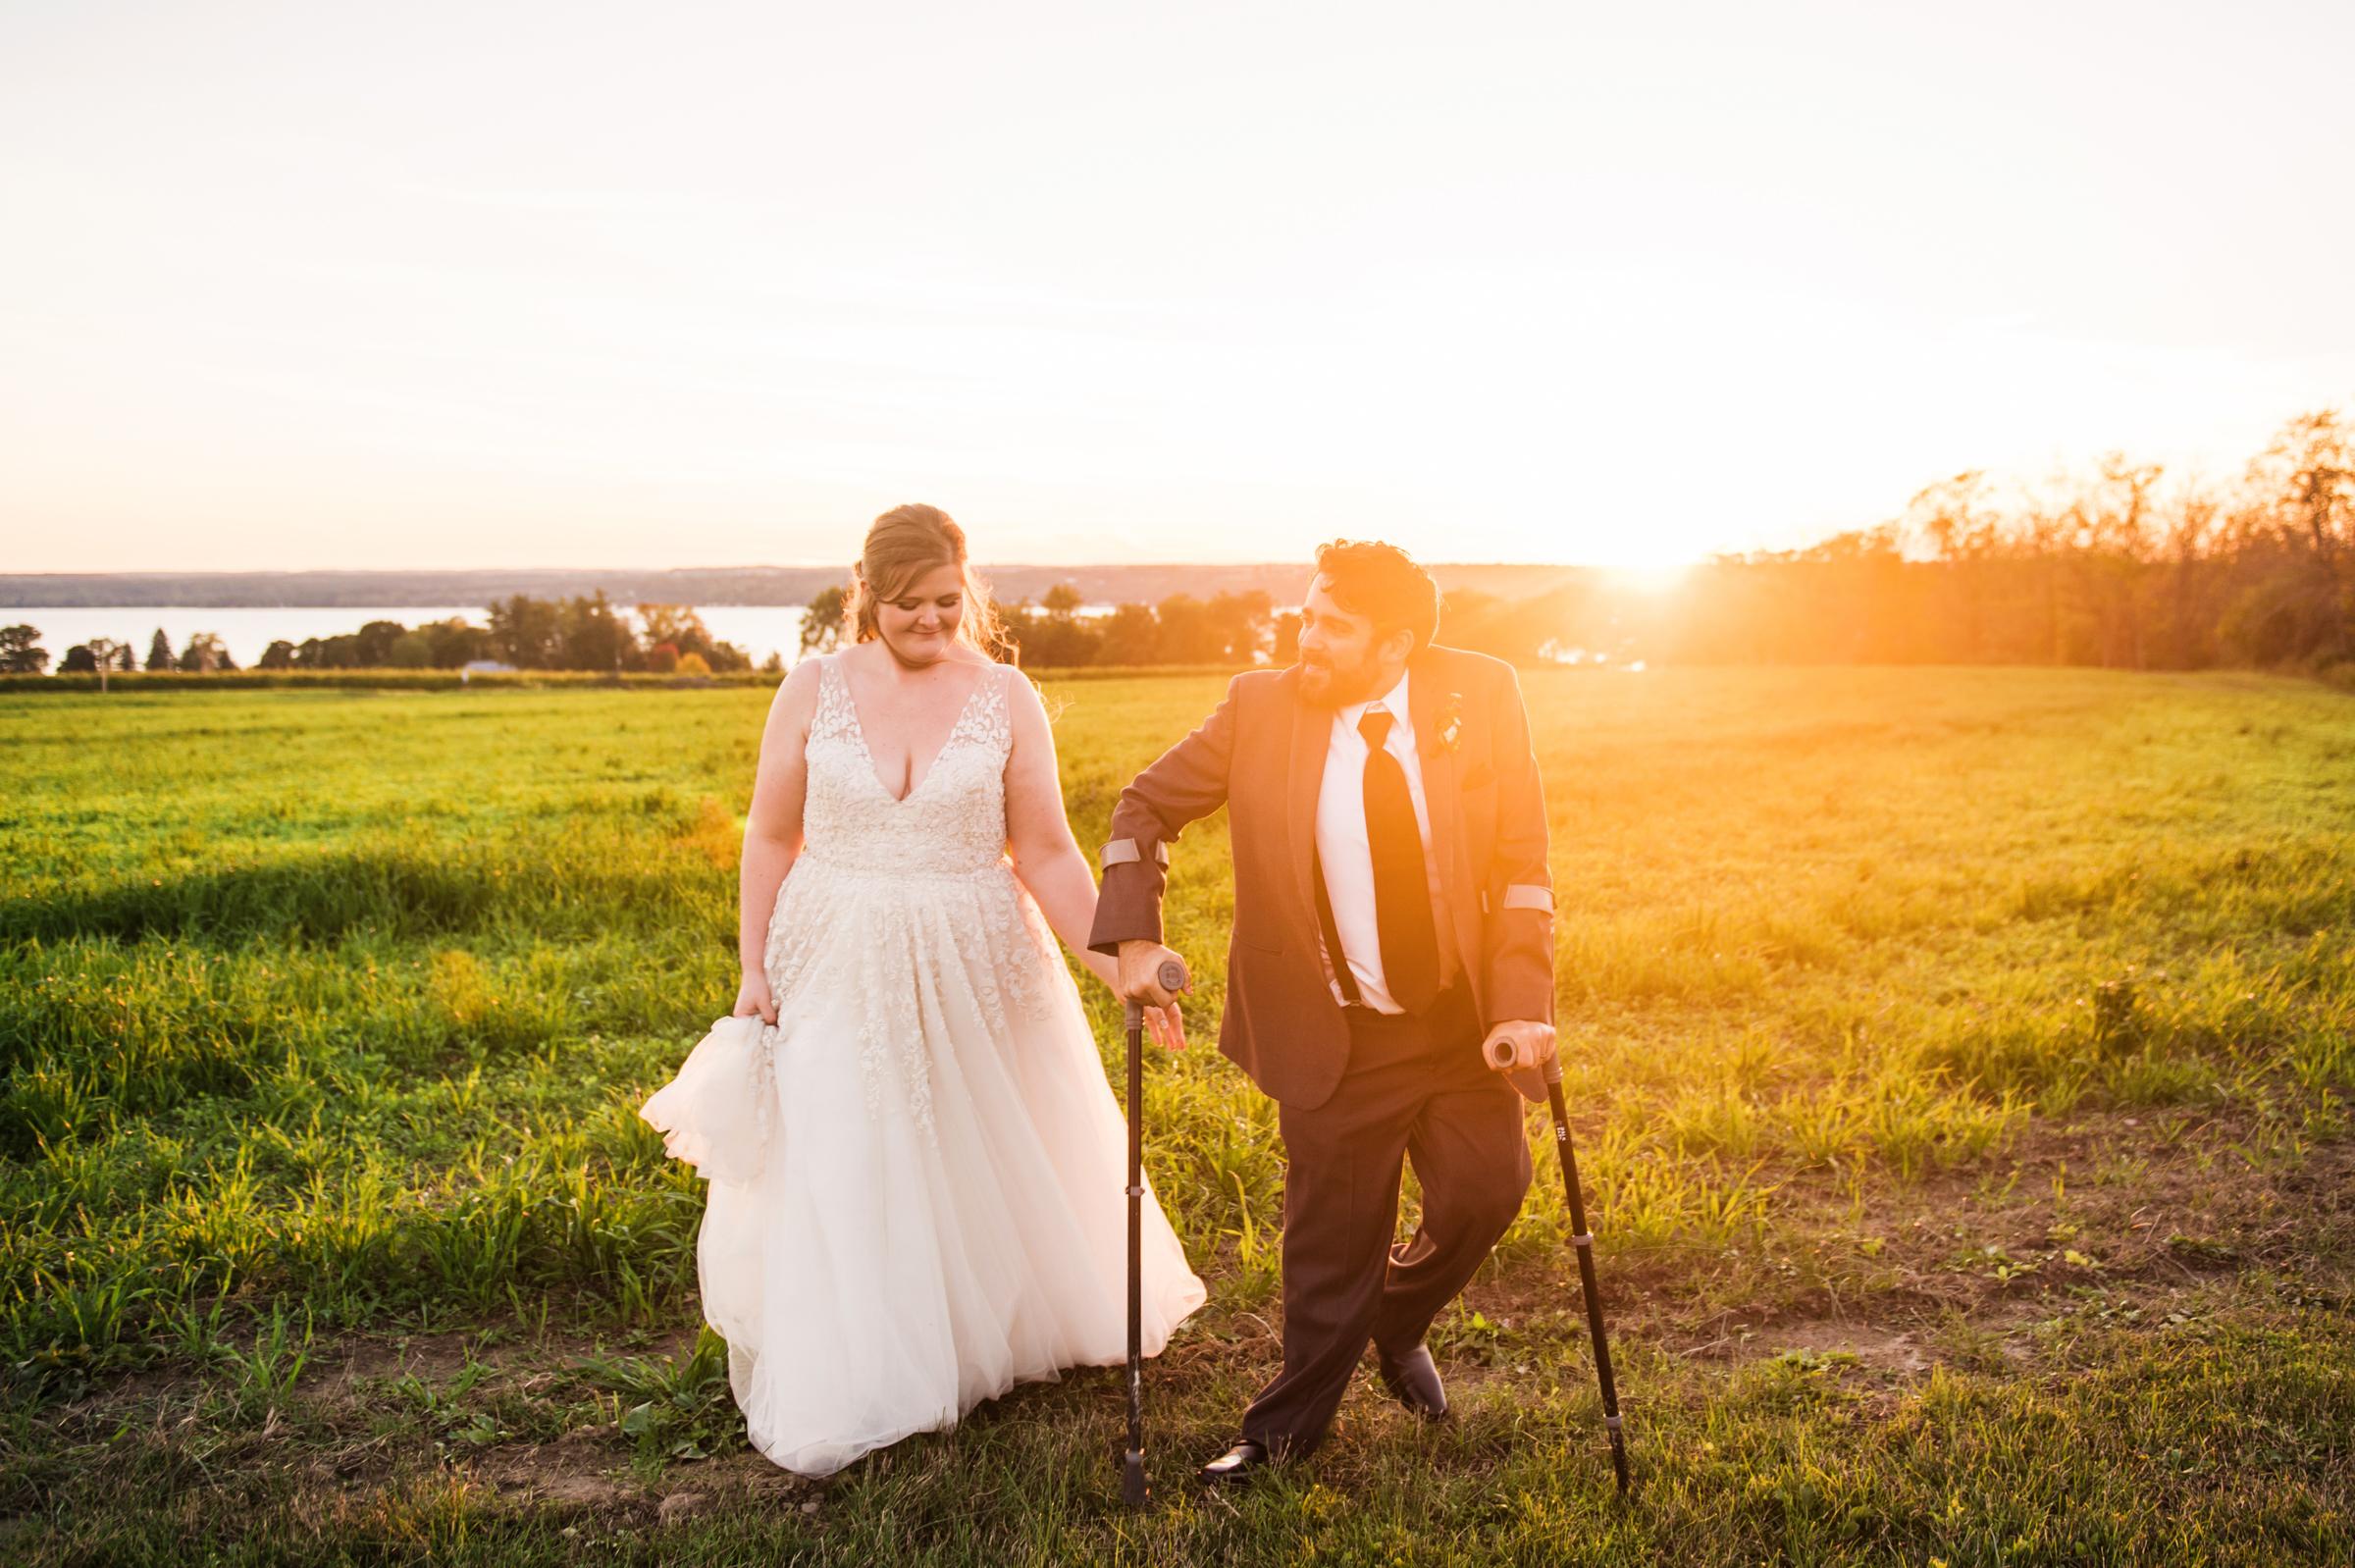 Zugibe_Vineyards_Finger_Lakes_Wedding_JILL_STUDIO_Rochester_NY_Photographer_DSC_4206.jpg